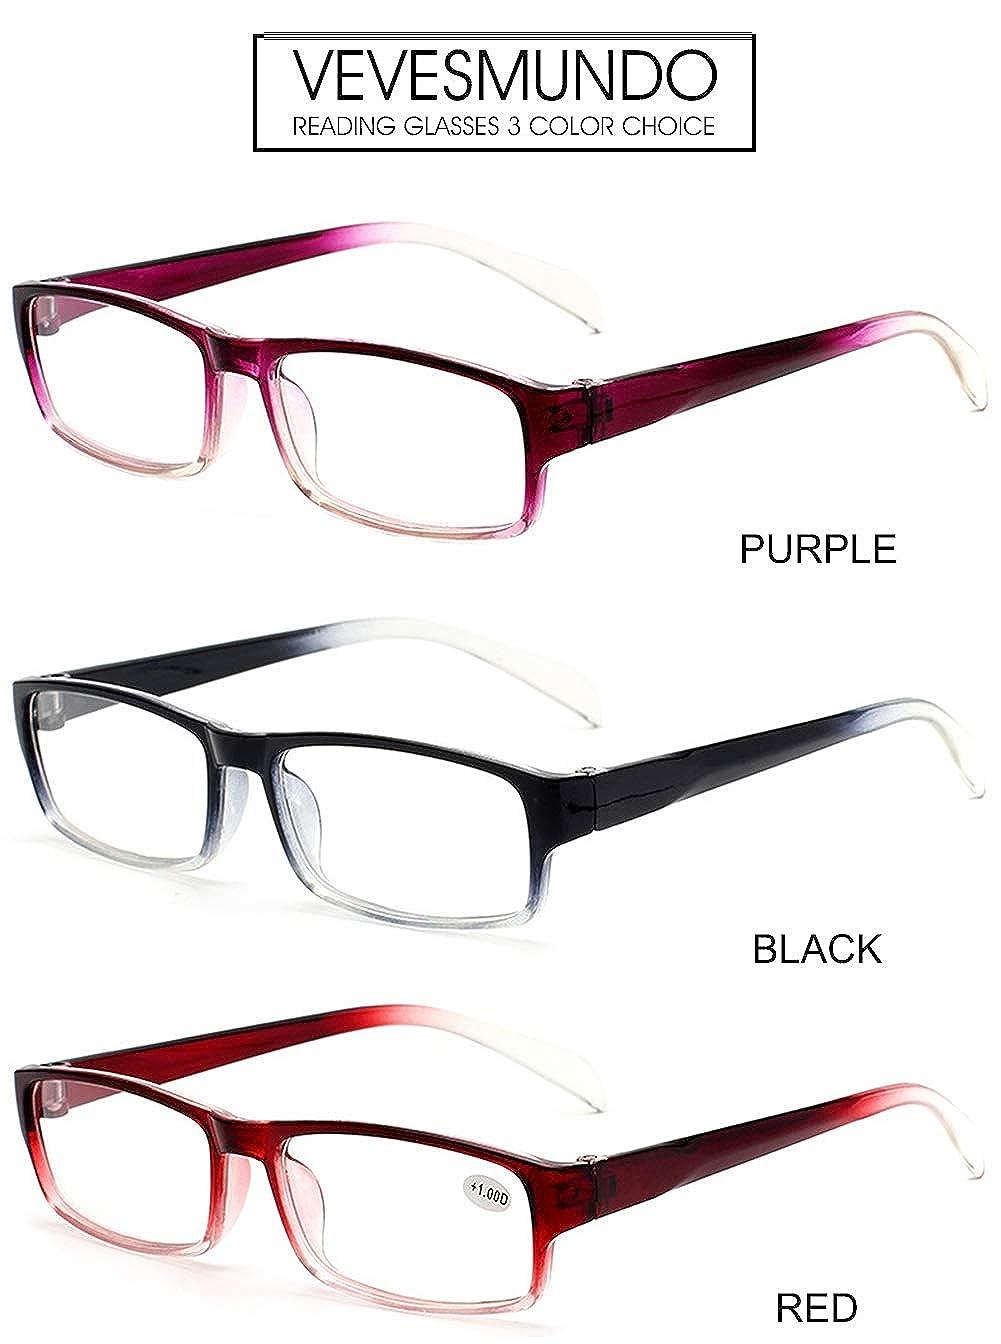 VEVESMUNDO Herren Damen Lesebrillen Lesebrille Rechteckige Designer Brille Augenoptik Sehhilfe Lesehilfe mit Sehst/ärke